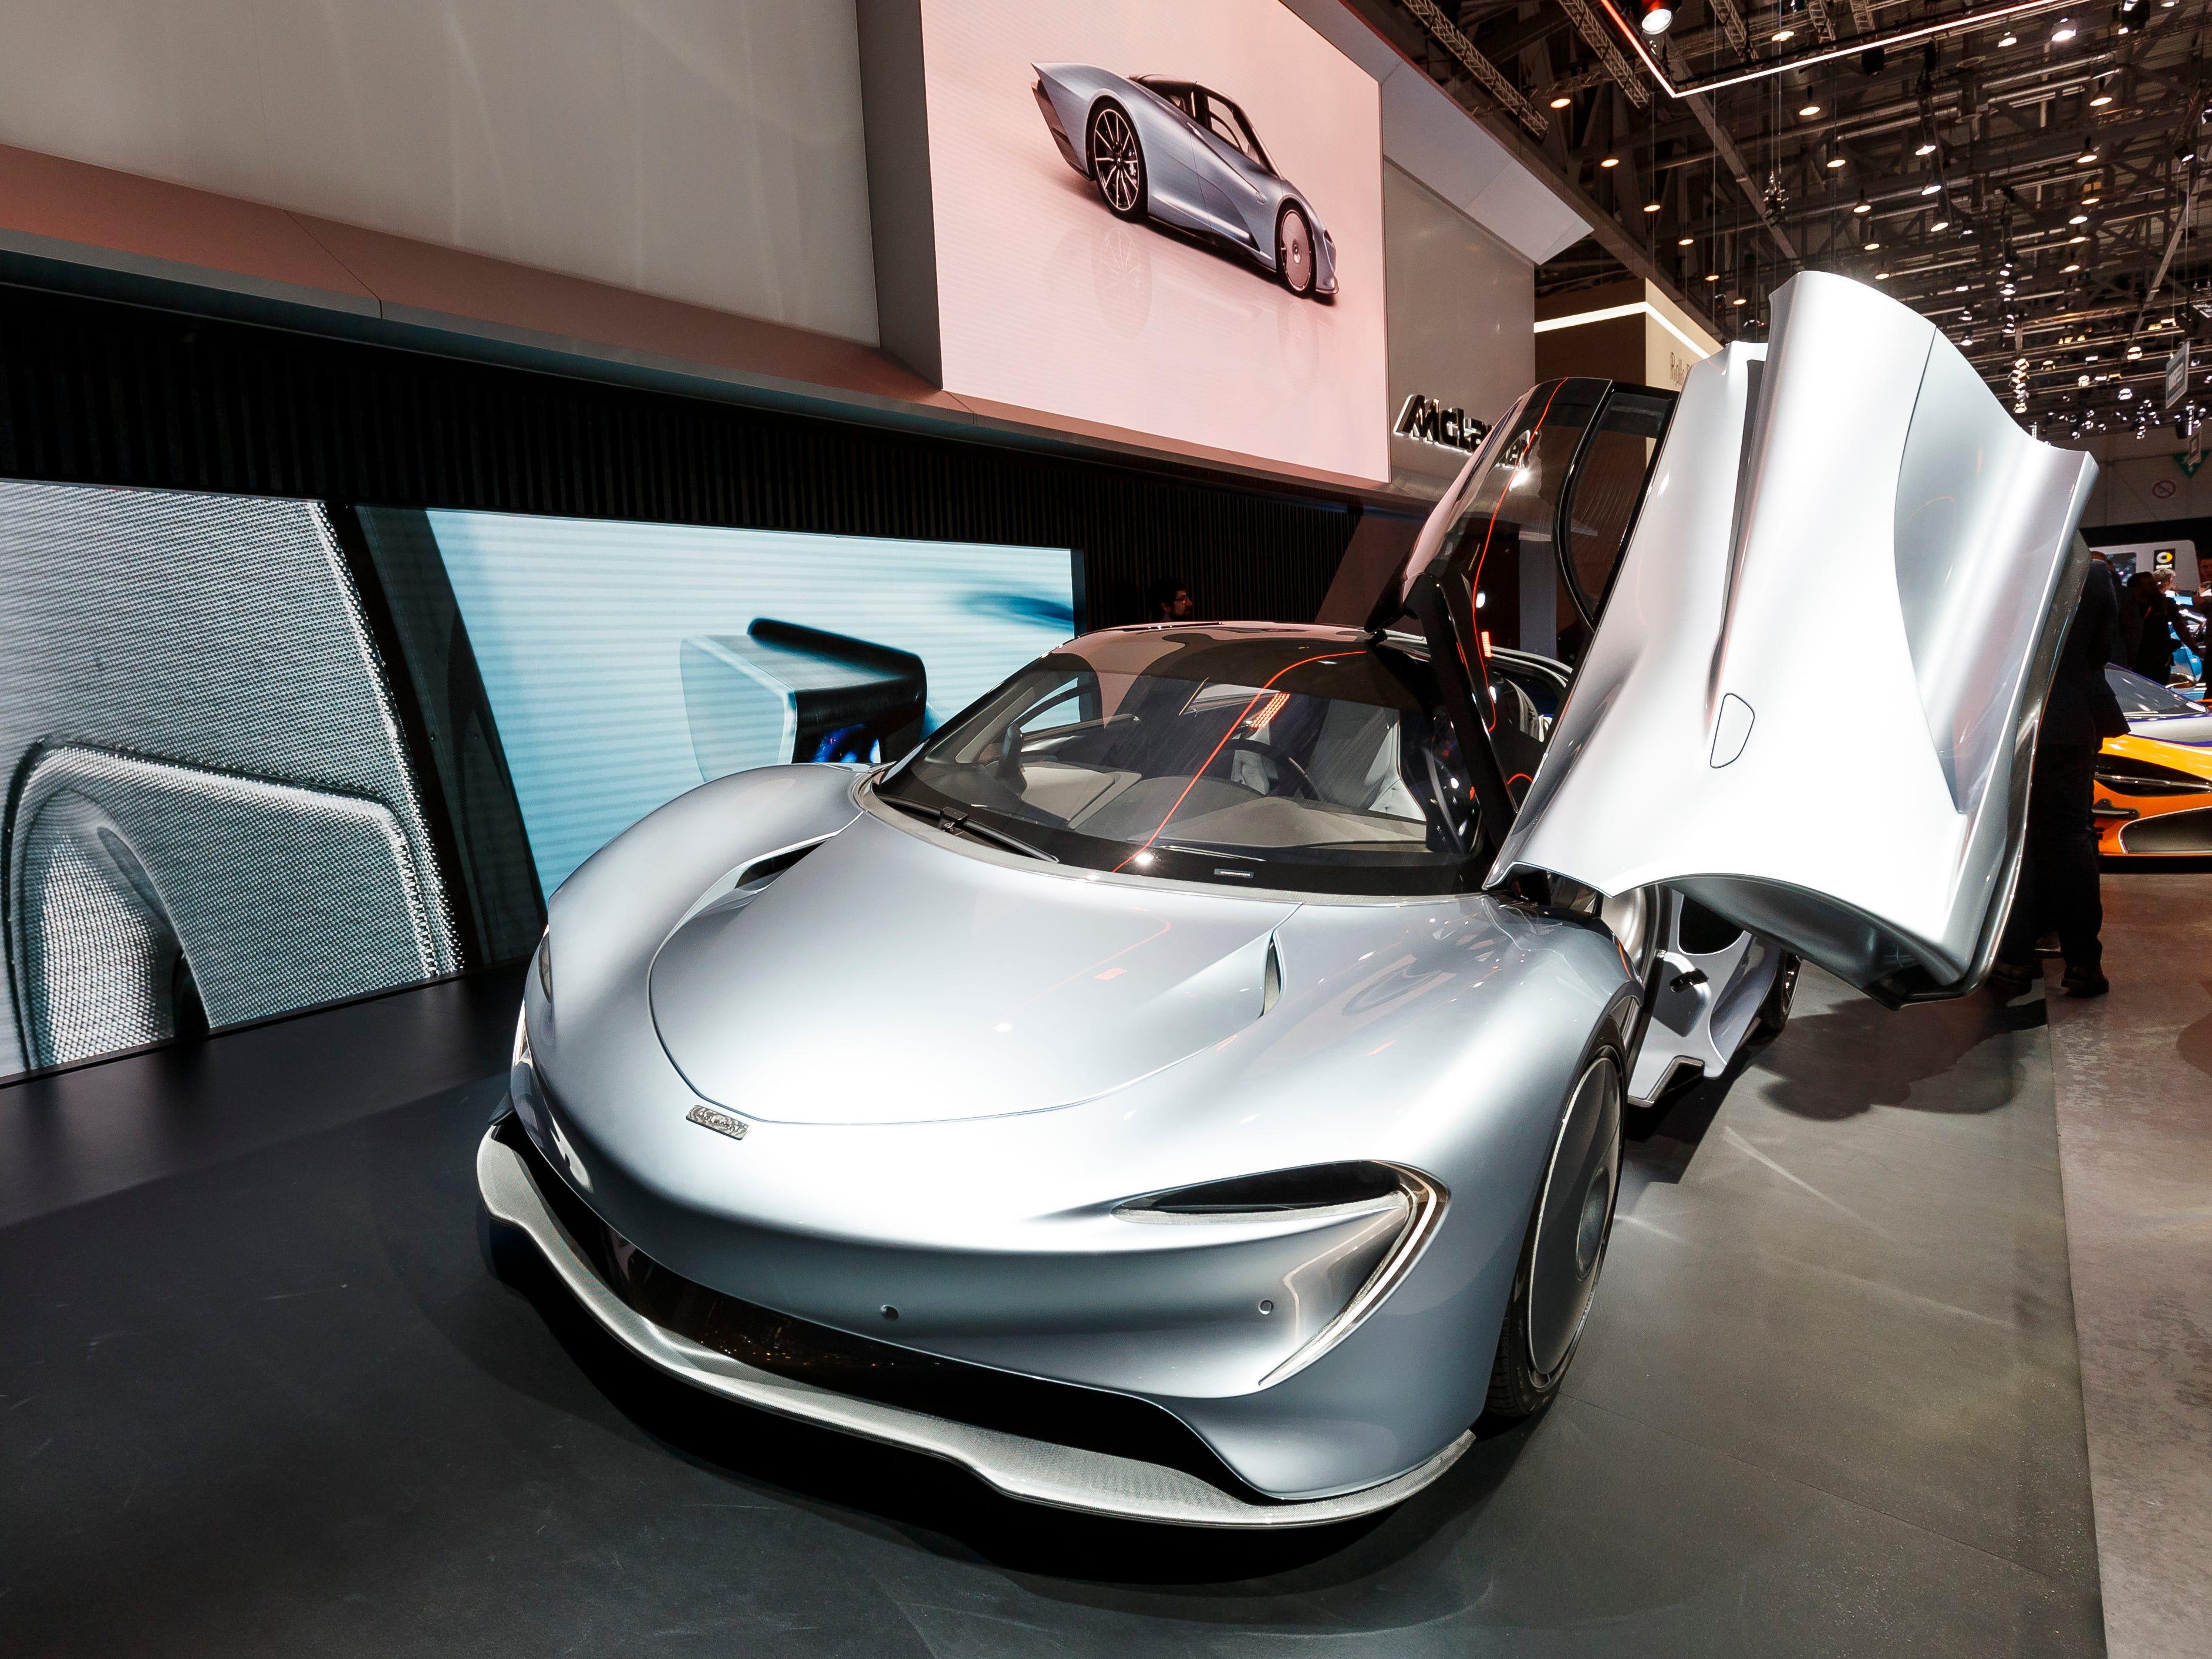 Doors lift upward on the new McLaren Speedtail concept car.